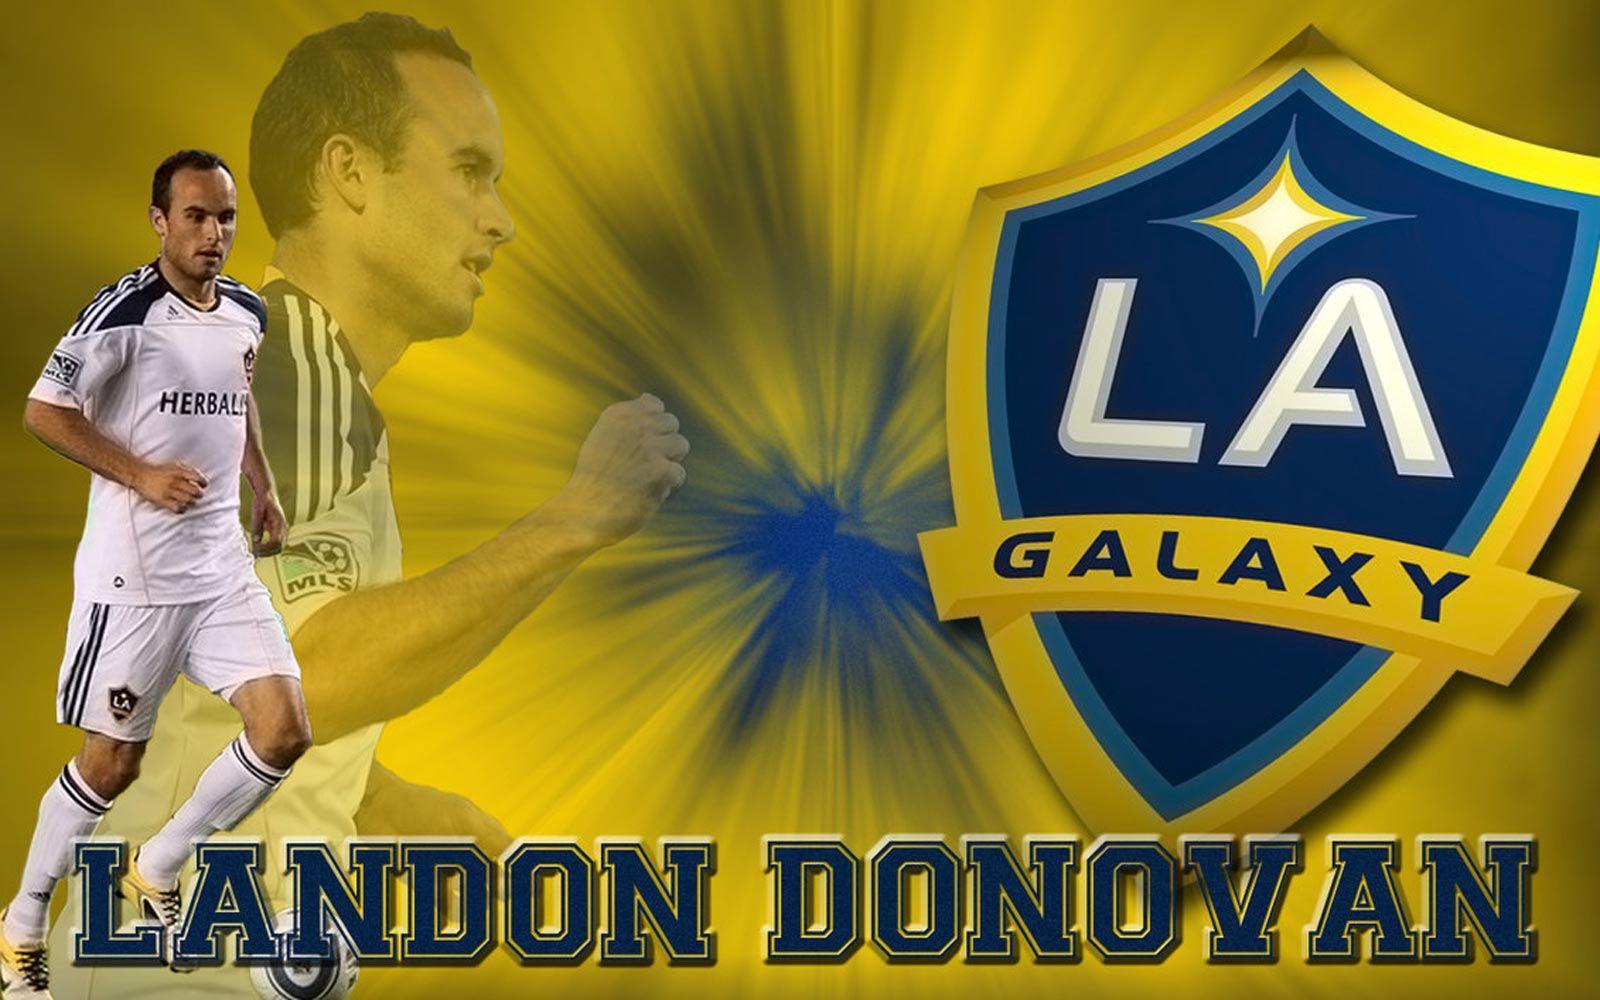 La Galaxy Landon Donovan 10 Landon Donovan La Galaxy Soccer Donovan